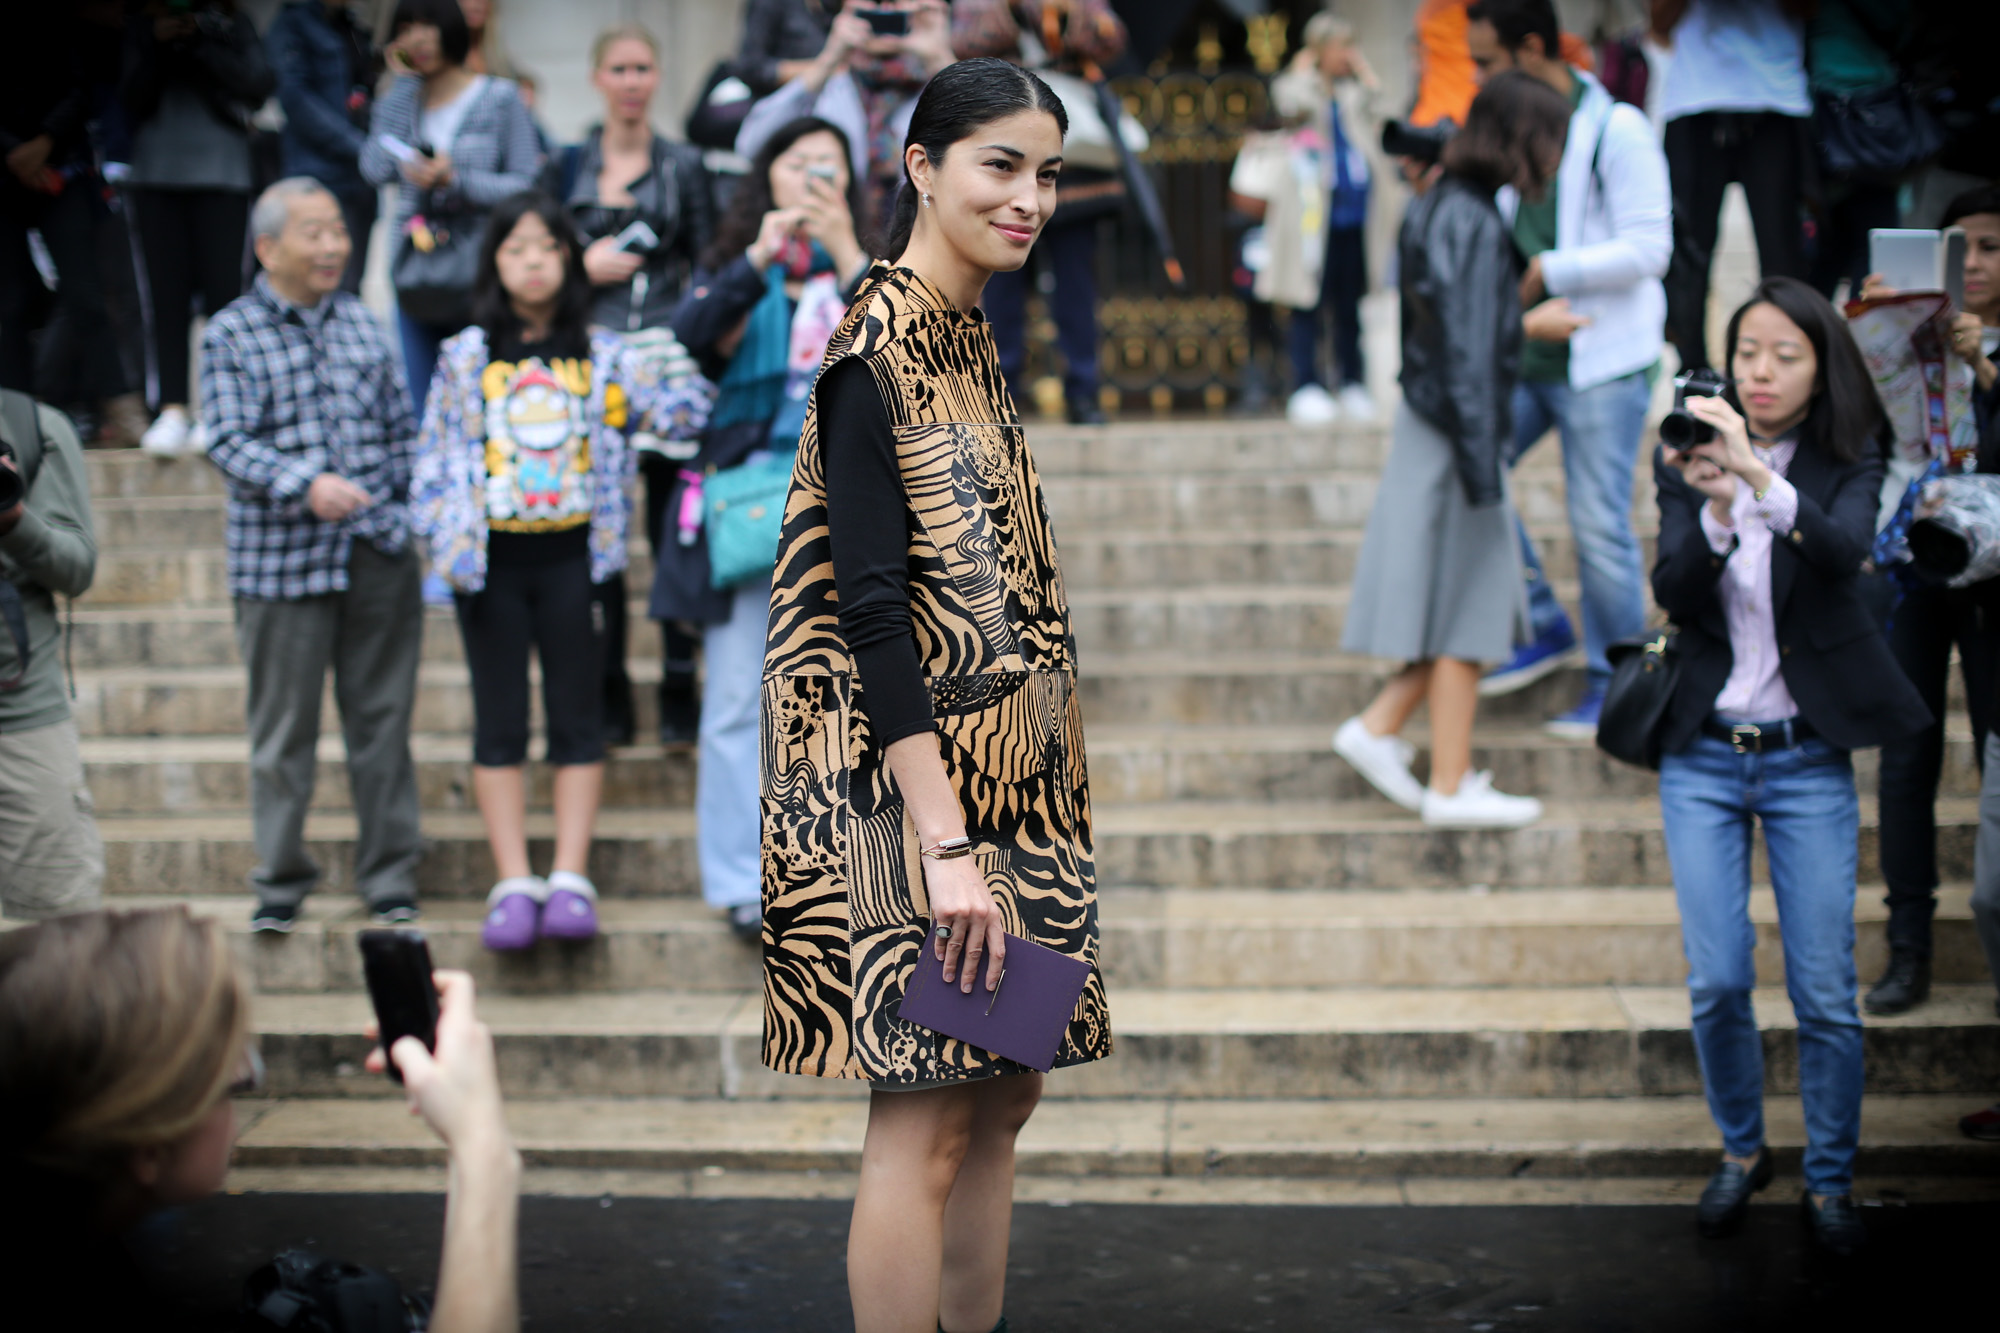 Clochet-streetstyle-caroline-issa-paris-fashion-week-3